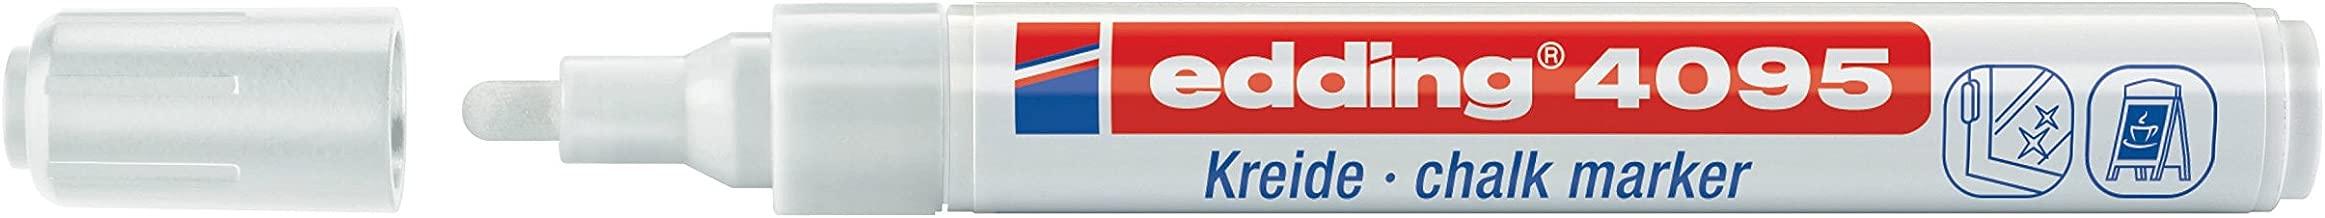 edding 4095 Fenster-/Kreidemarker, 2-3mm, weiß